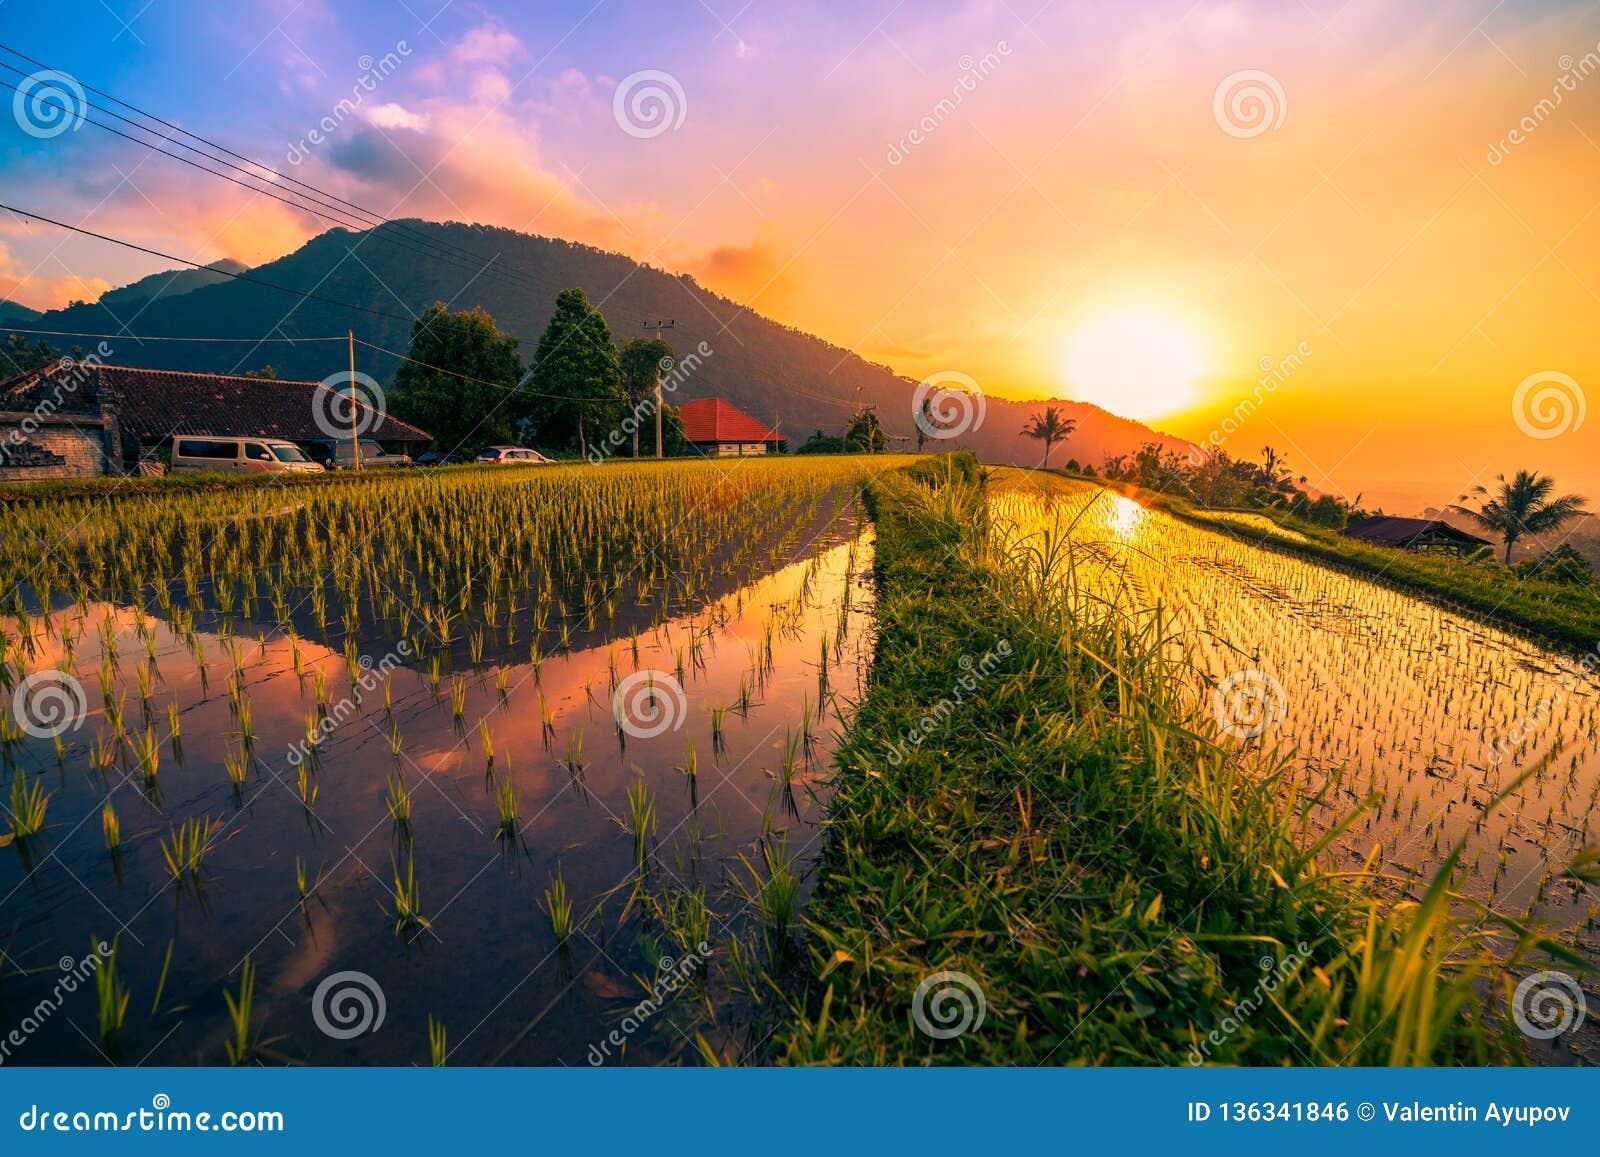 Sunset on rice fields on Jatiluwih terraced of Ubud, Bali, Indonesia